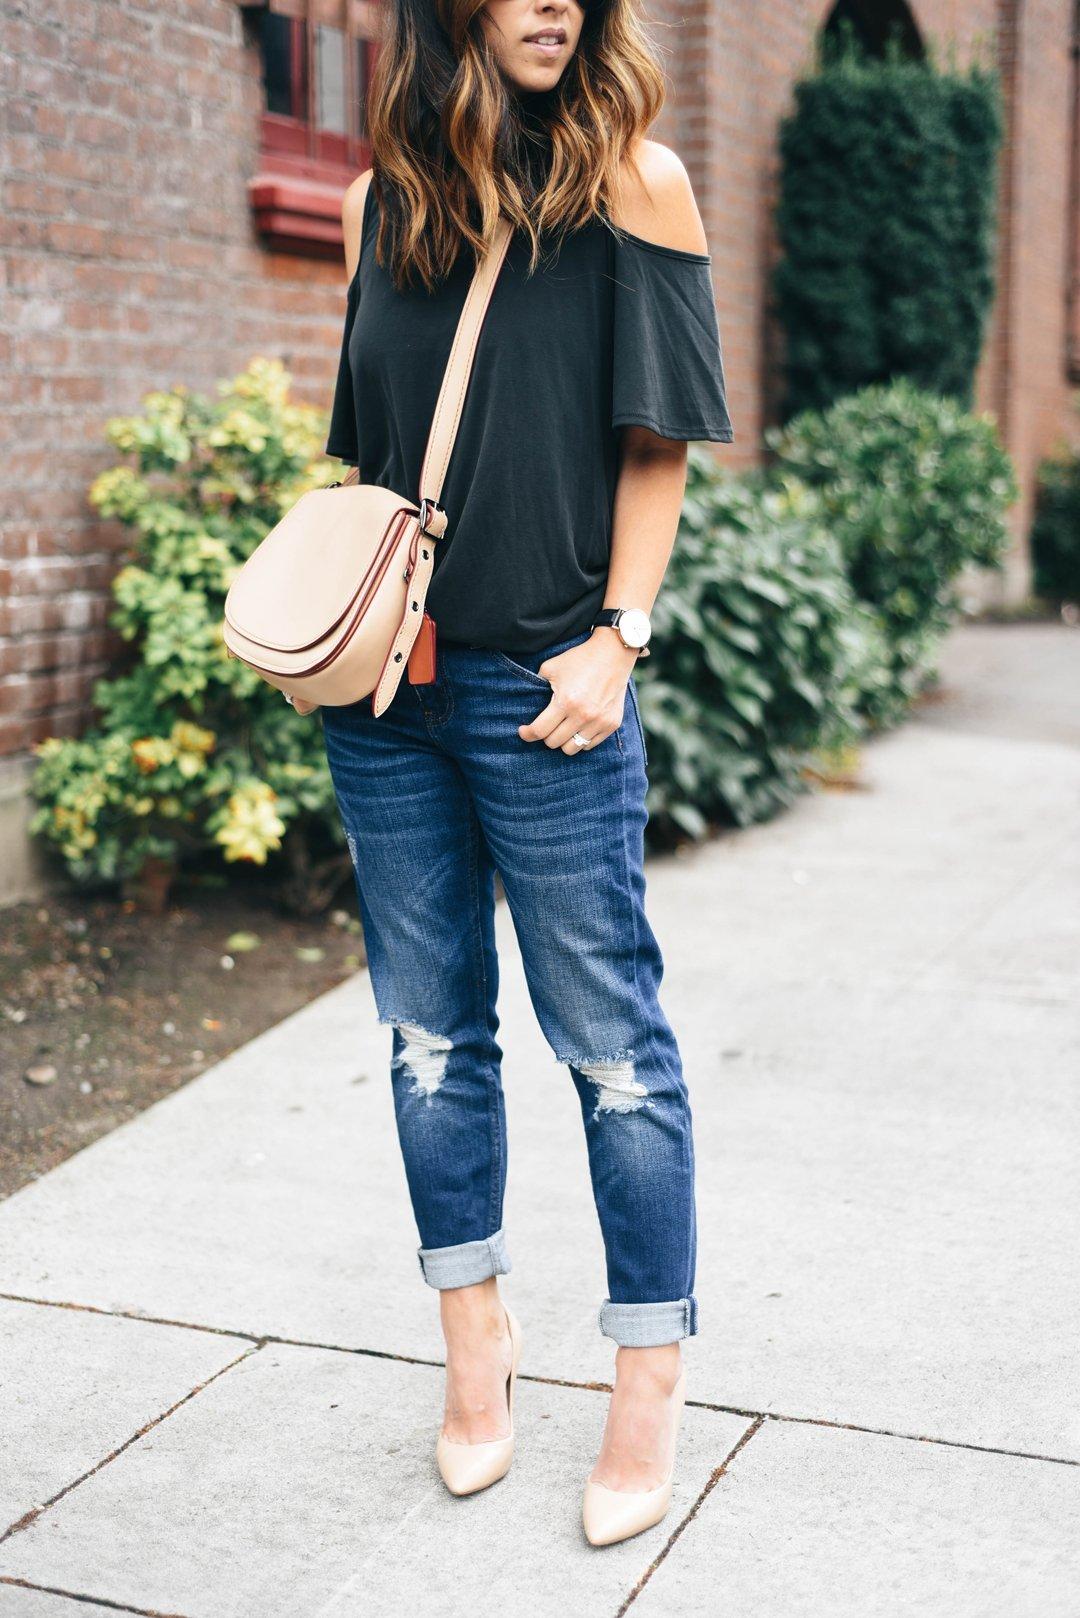 Crystalin Marie wearing Topshop 'Lucus' Petite Ripped Boyfriend Jeans